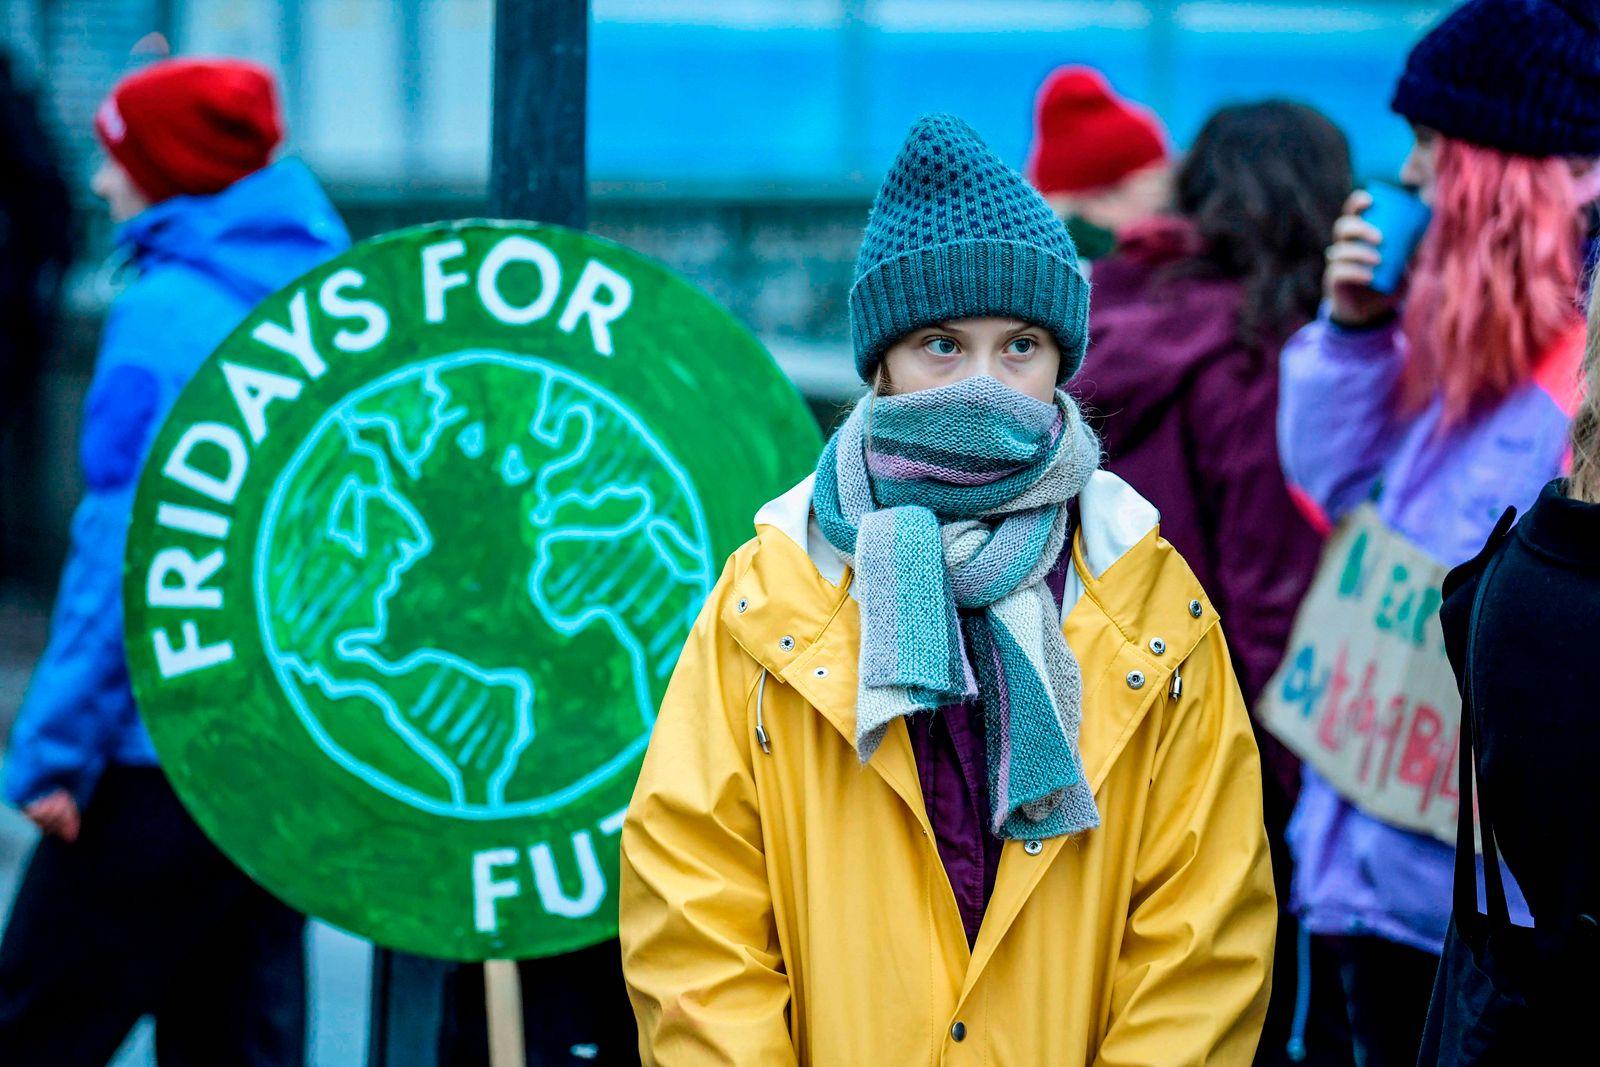 SWEDEN-POLITICS-ENVIRONMENT-CLIMATE-STRIKE